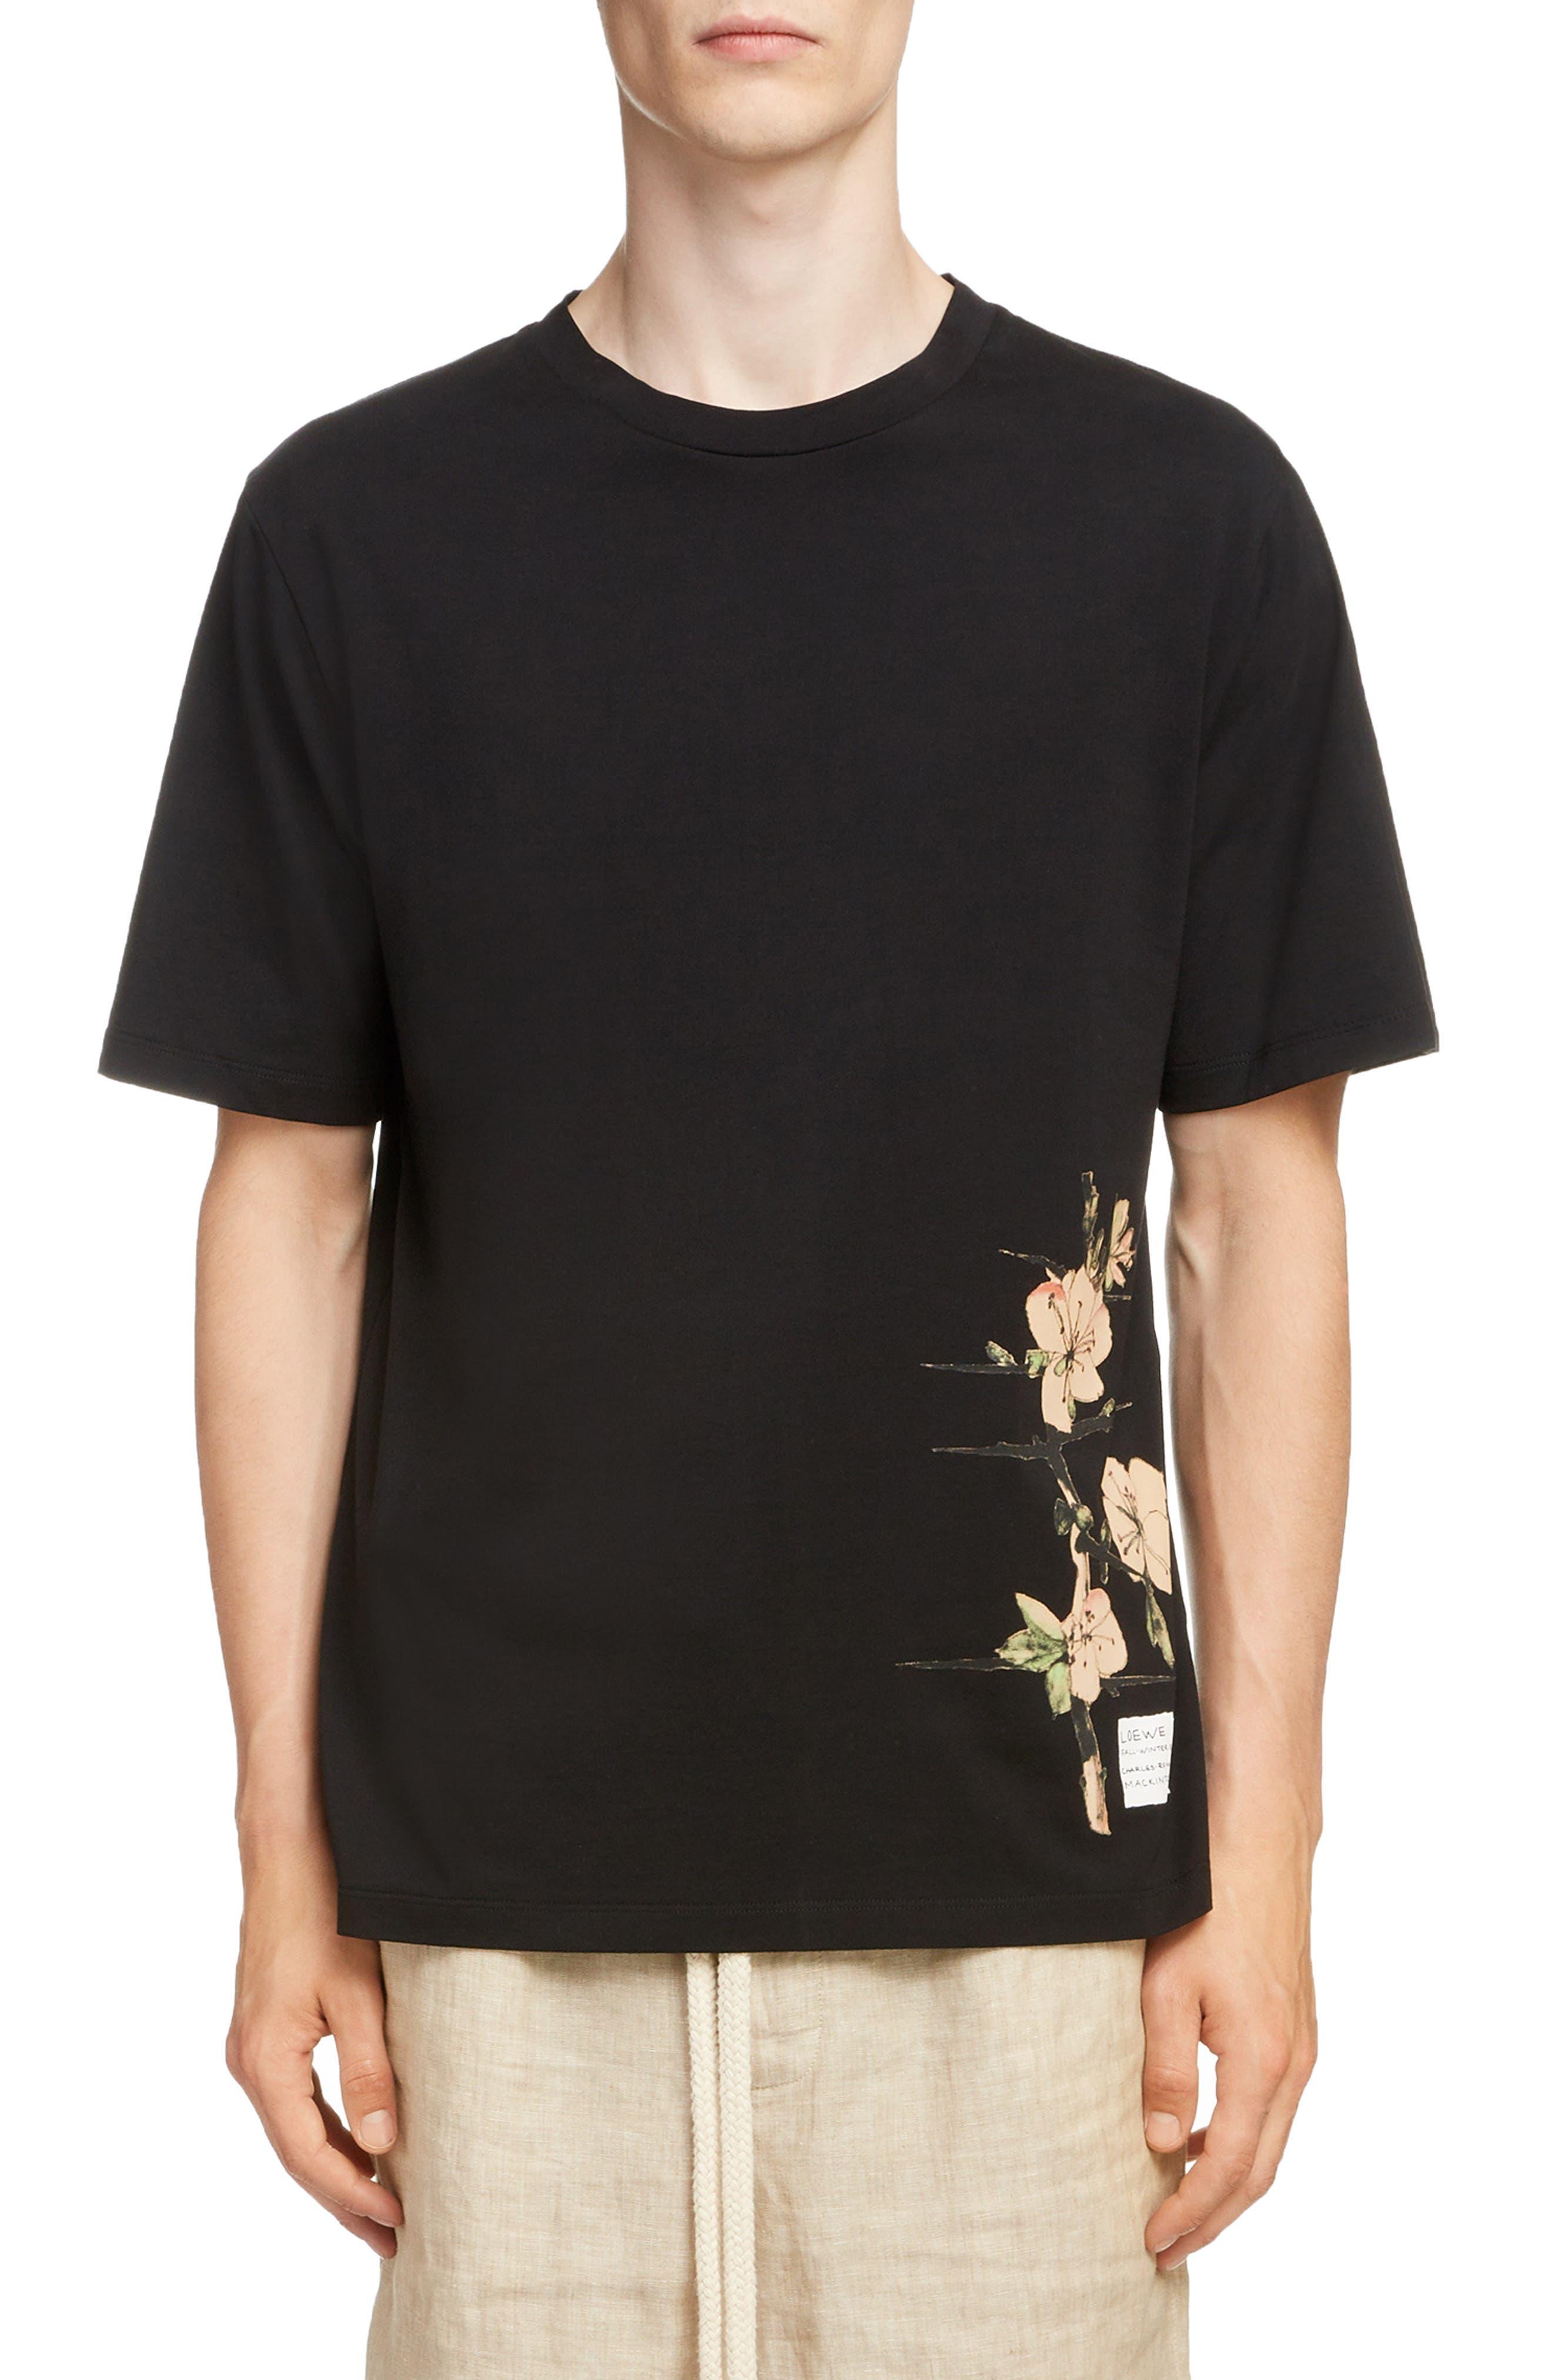 LOEWE Charles Rennie Mackintosh Collection Botanical Print T-Shirt, Main, color, 1100-BLACK